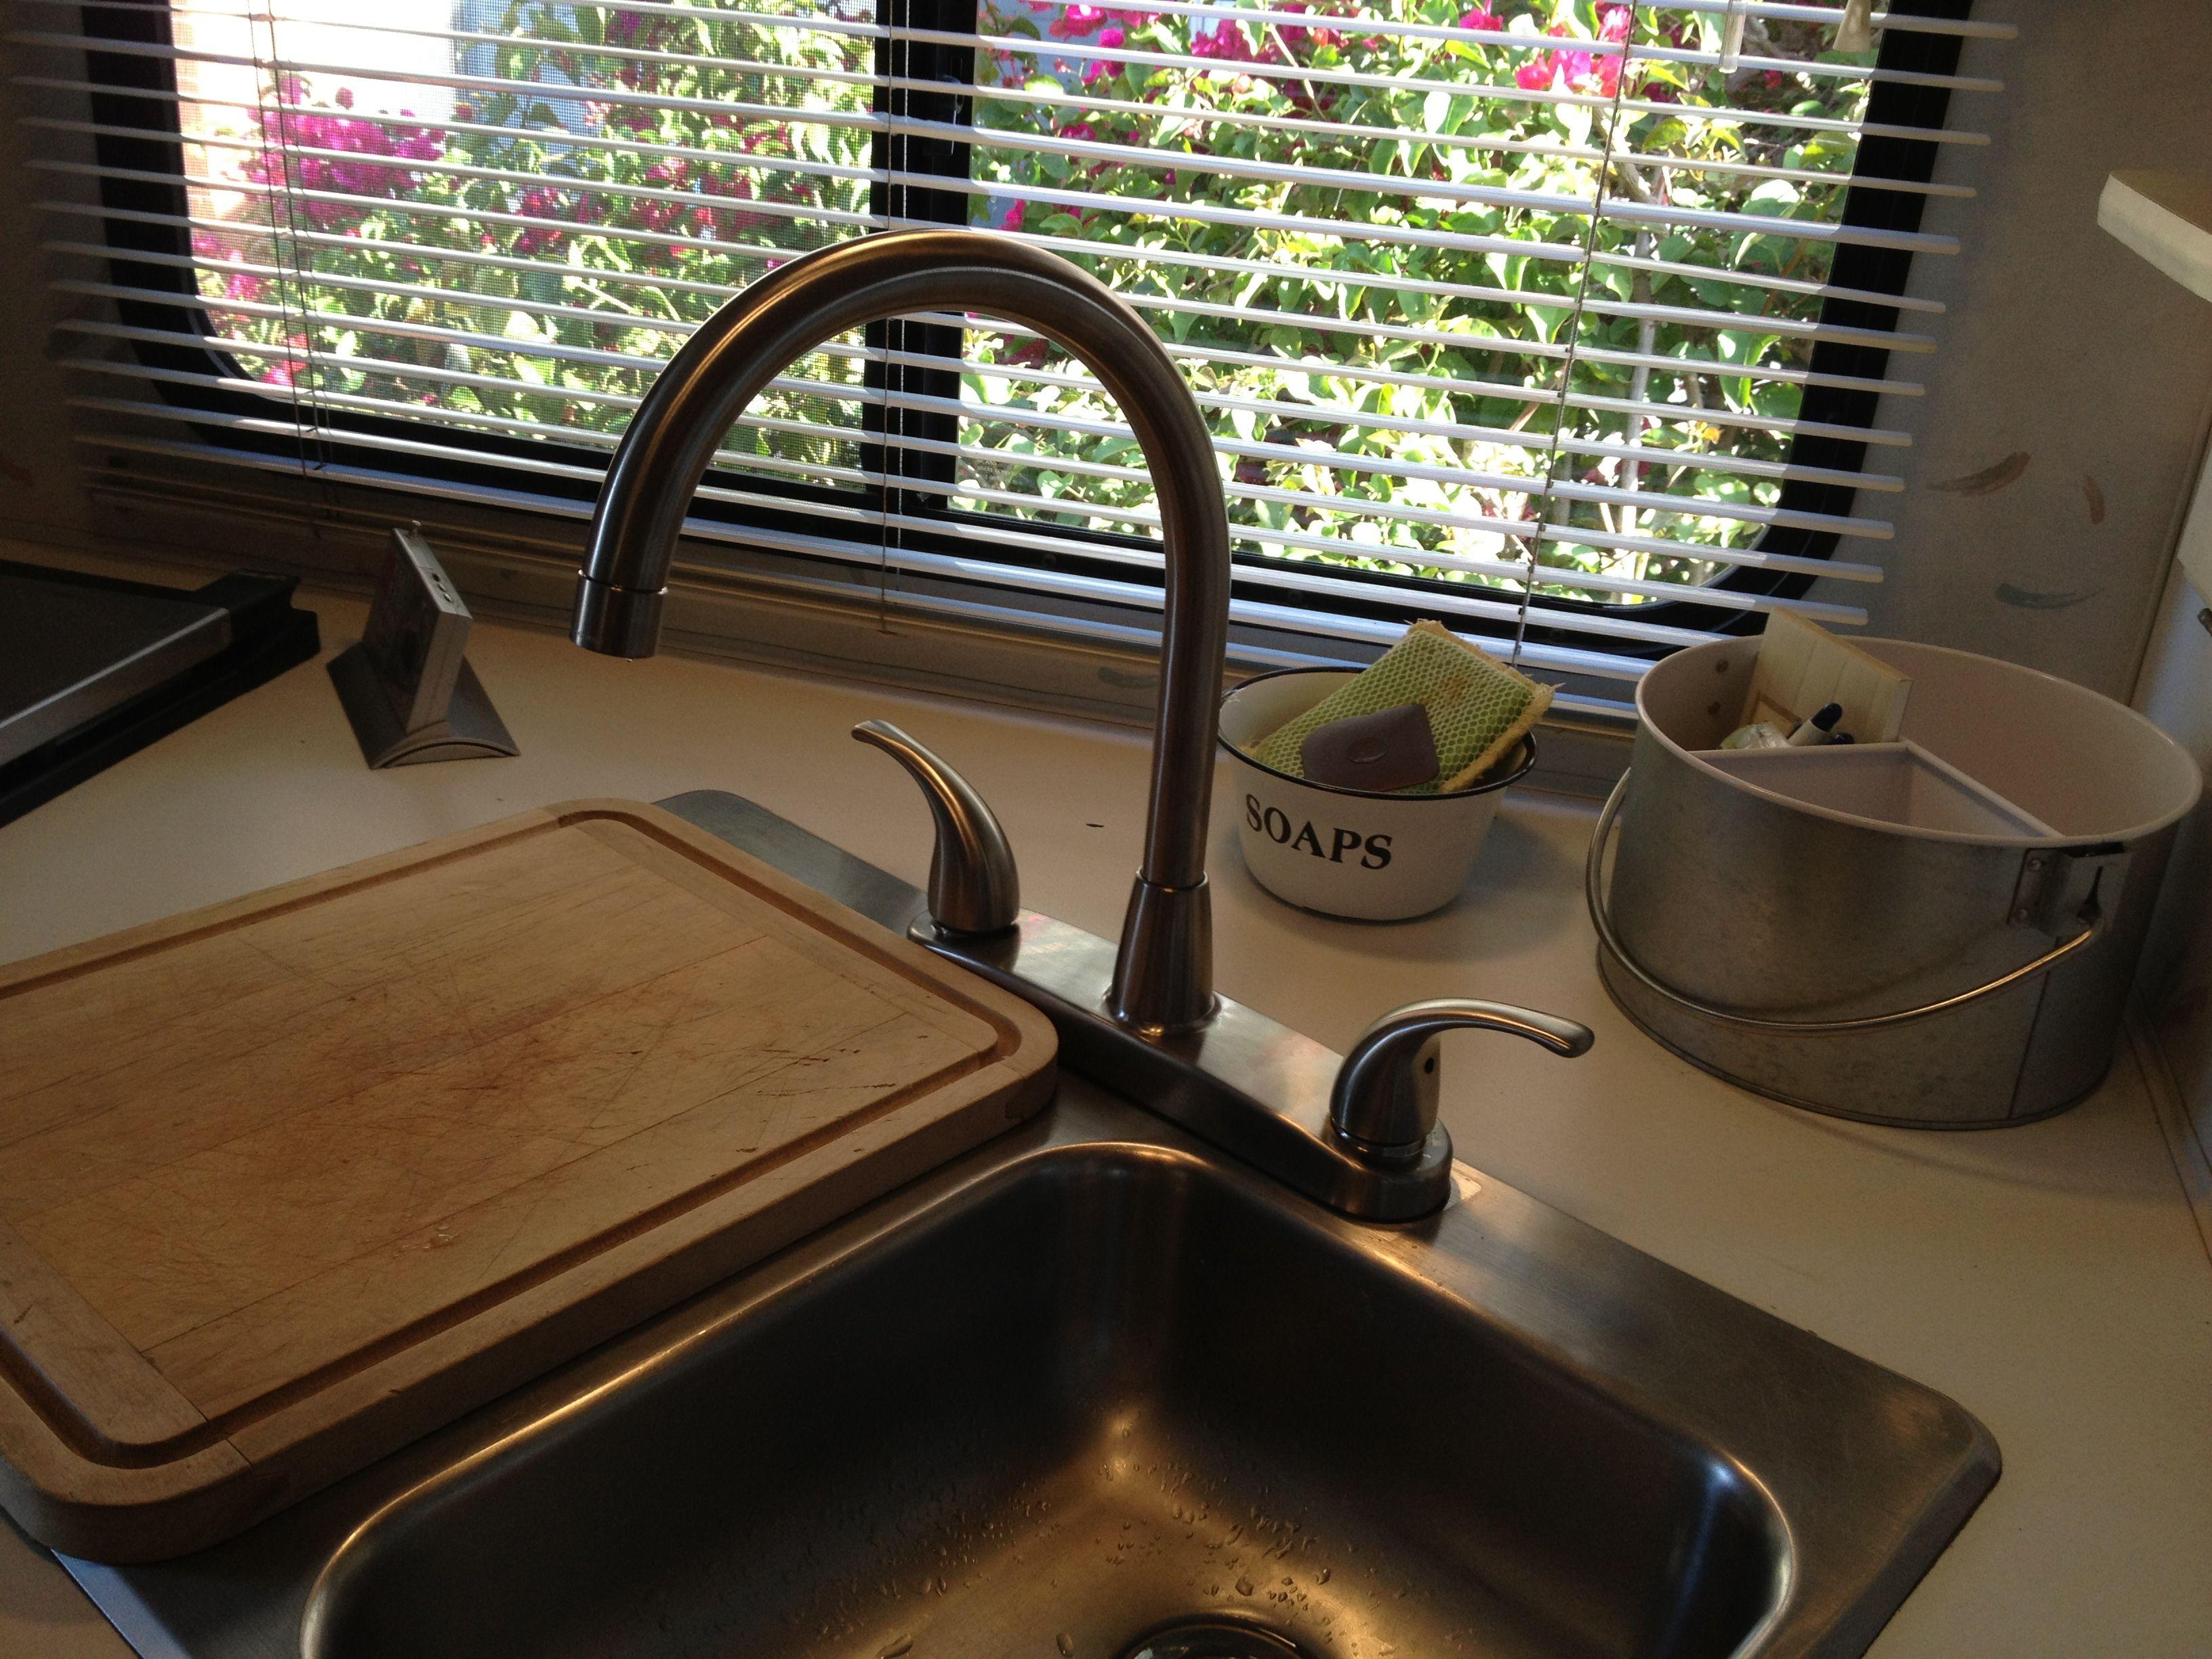 New Sink Faucet In My Lance Camper Lance Camper